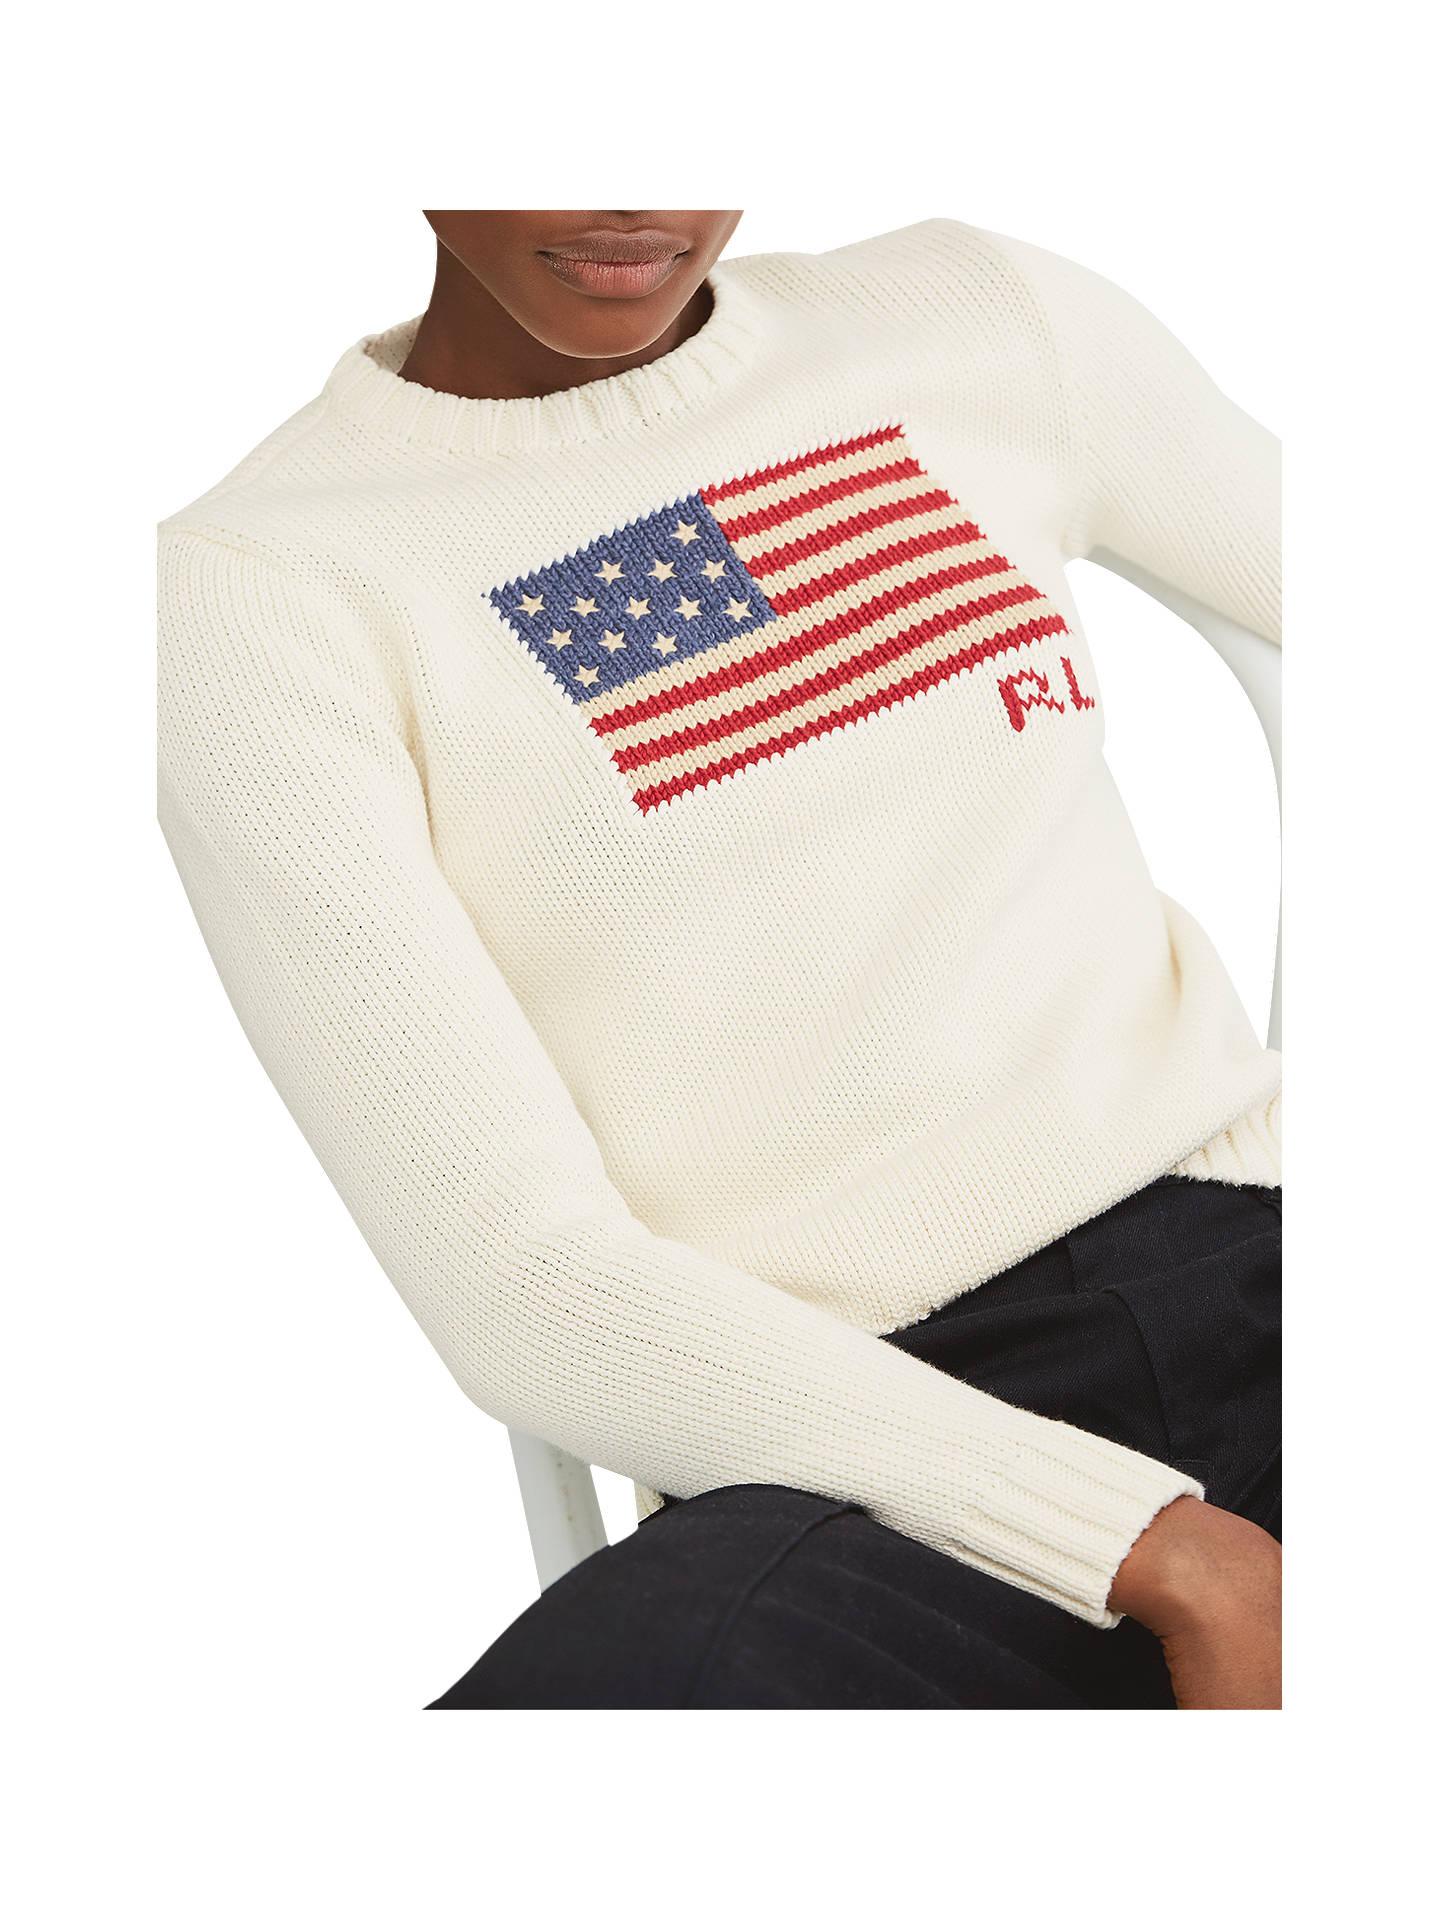 23b4d781d351 Polo Ralph Lauren Flag Cotton Jumper at John Lewis   Partners